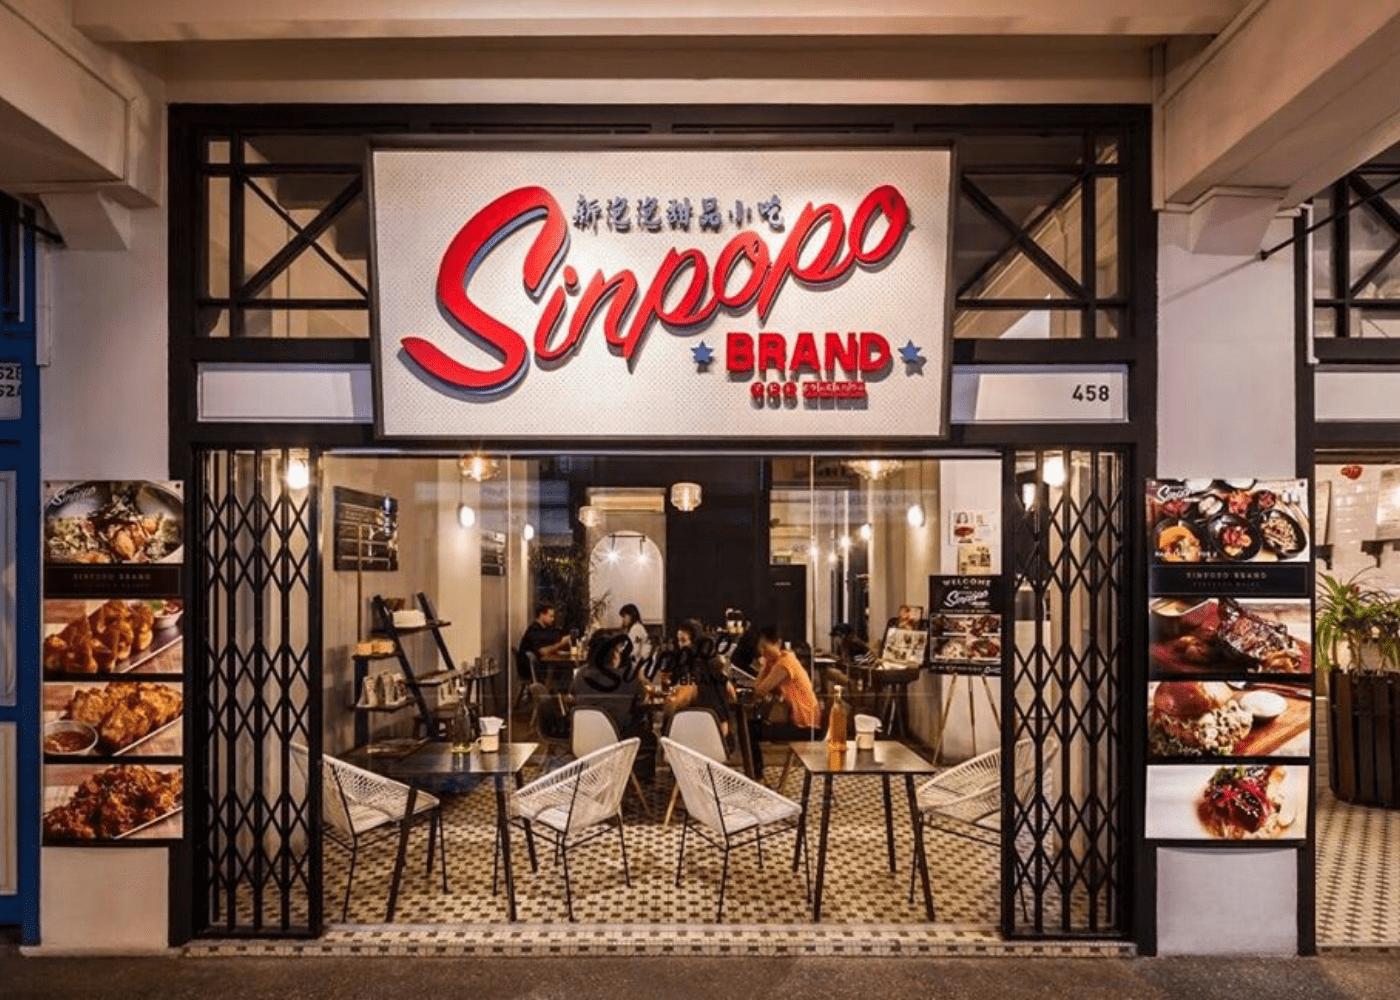 Sinpopo Brand | Joo Chiat